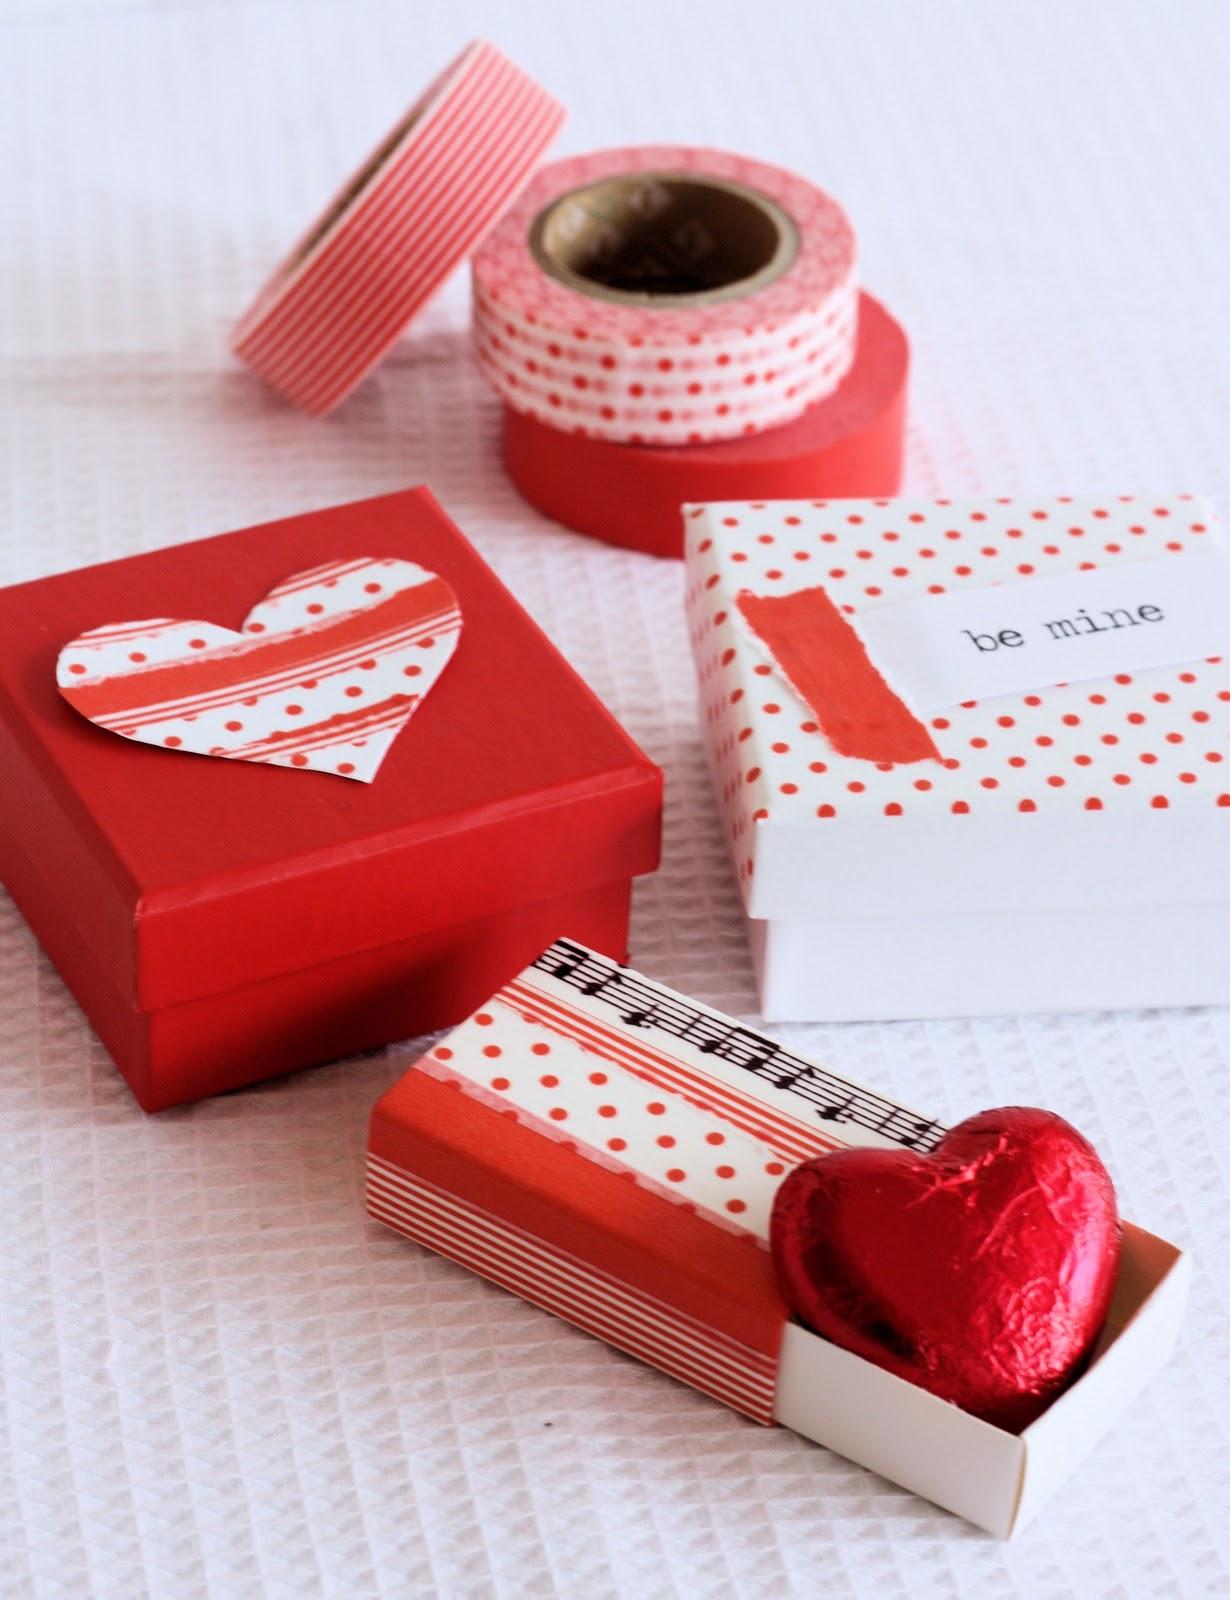 http://1.bp.blogspot.com/-OzlHQBUoqXo/TyjLbmf_VLI/AAAAAAAAEUk/r1LIXvo9PP0/s1600/Valentines%2BWashi%2BBoxes%2B1.jpg